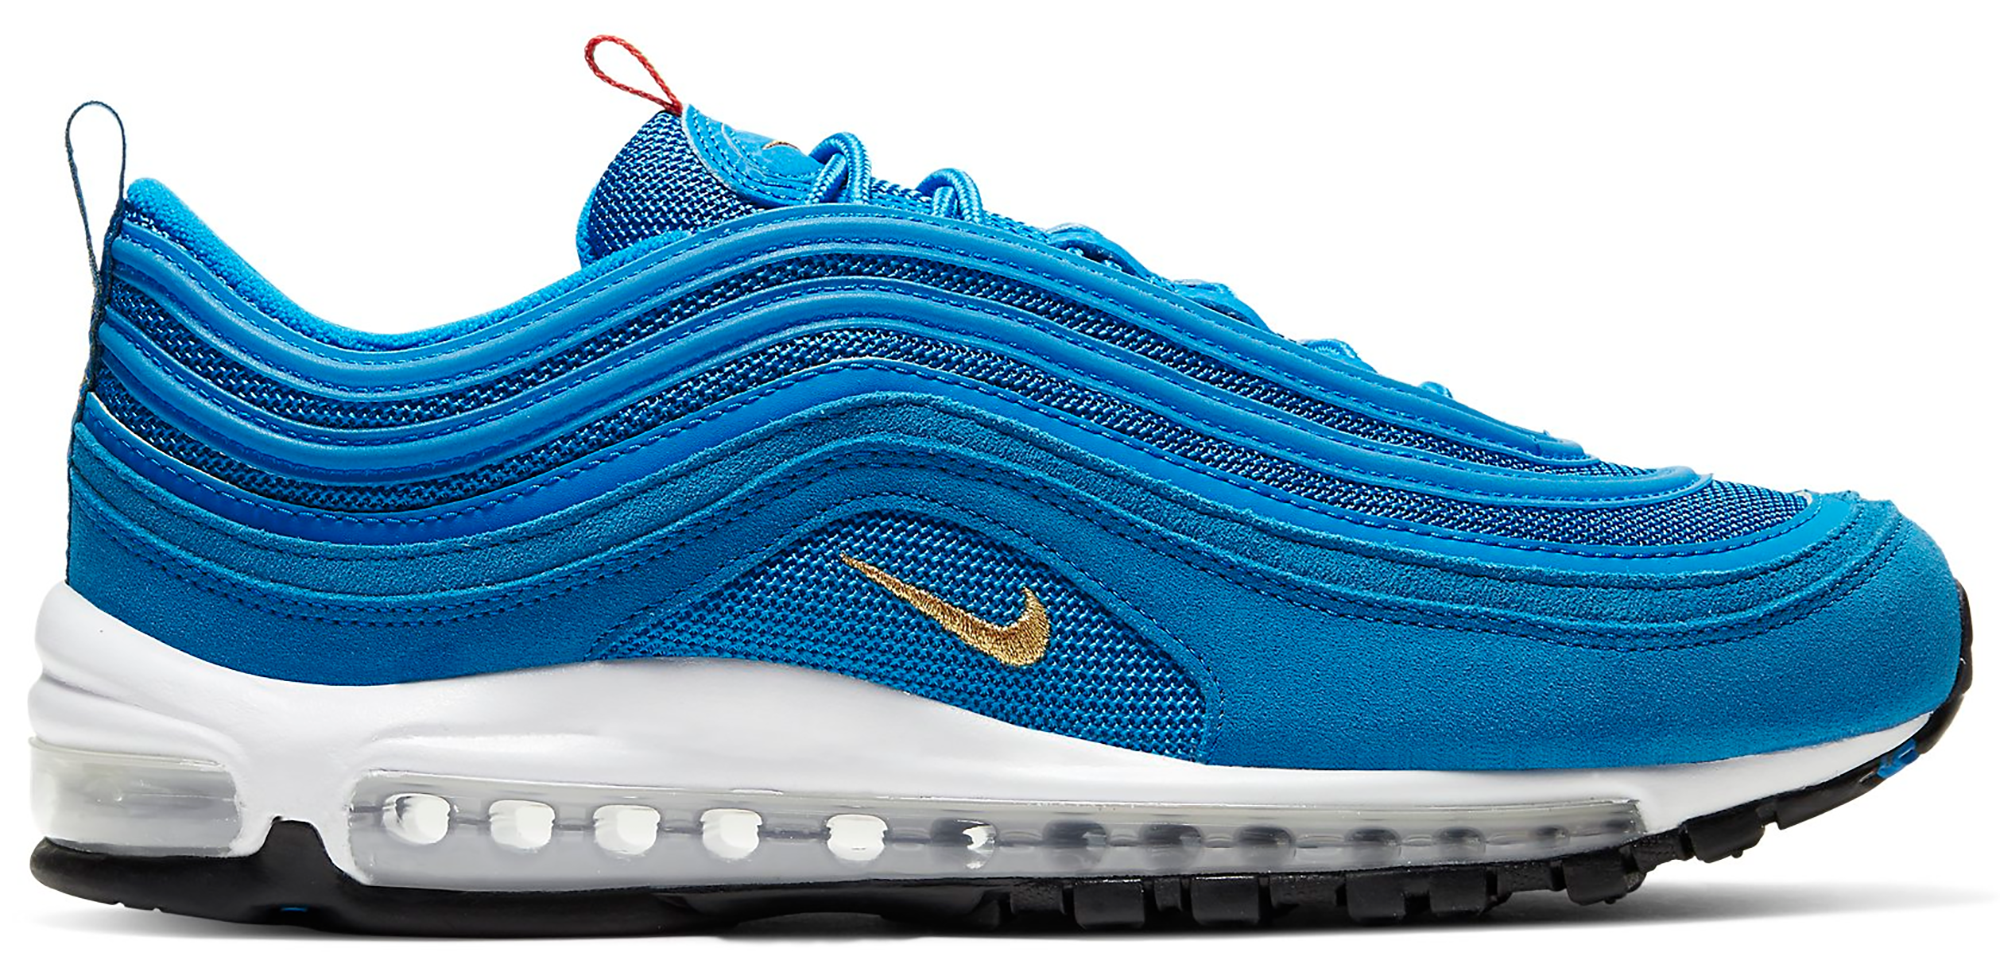 Nike Air Max 97 Olympic Rings Pack Blue